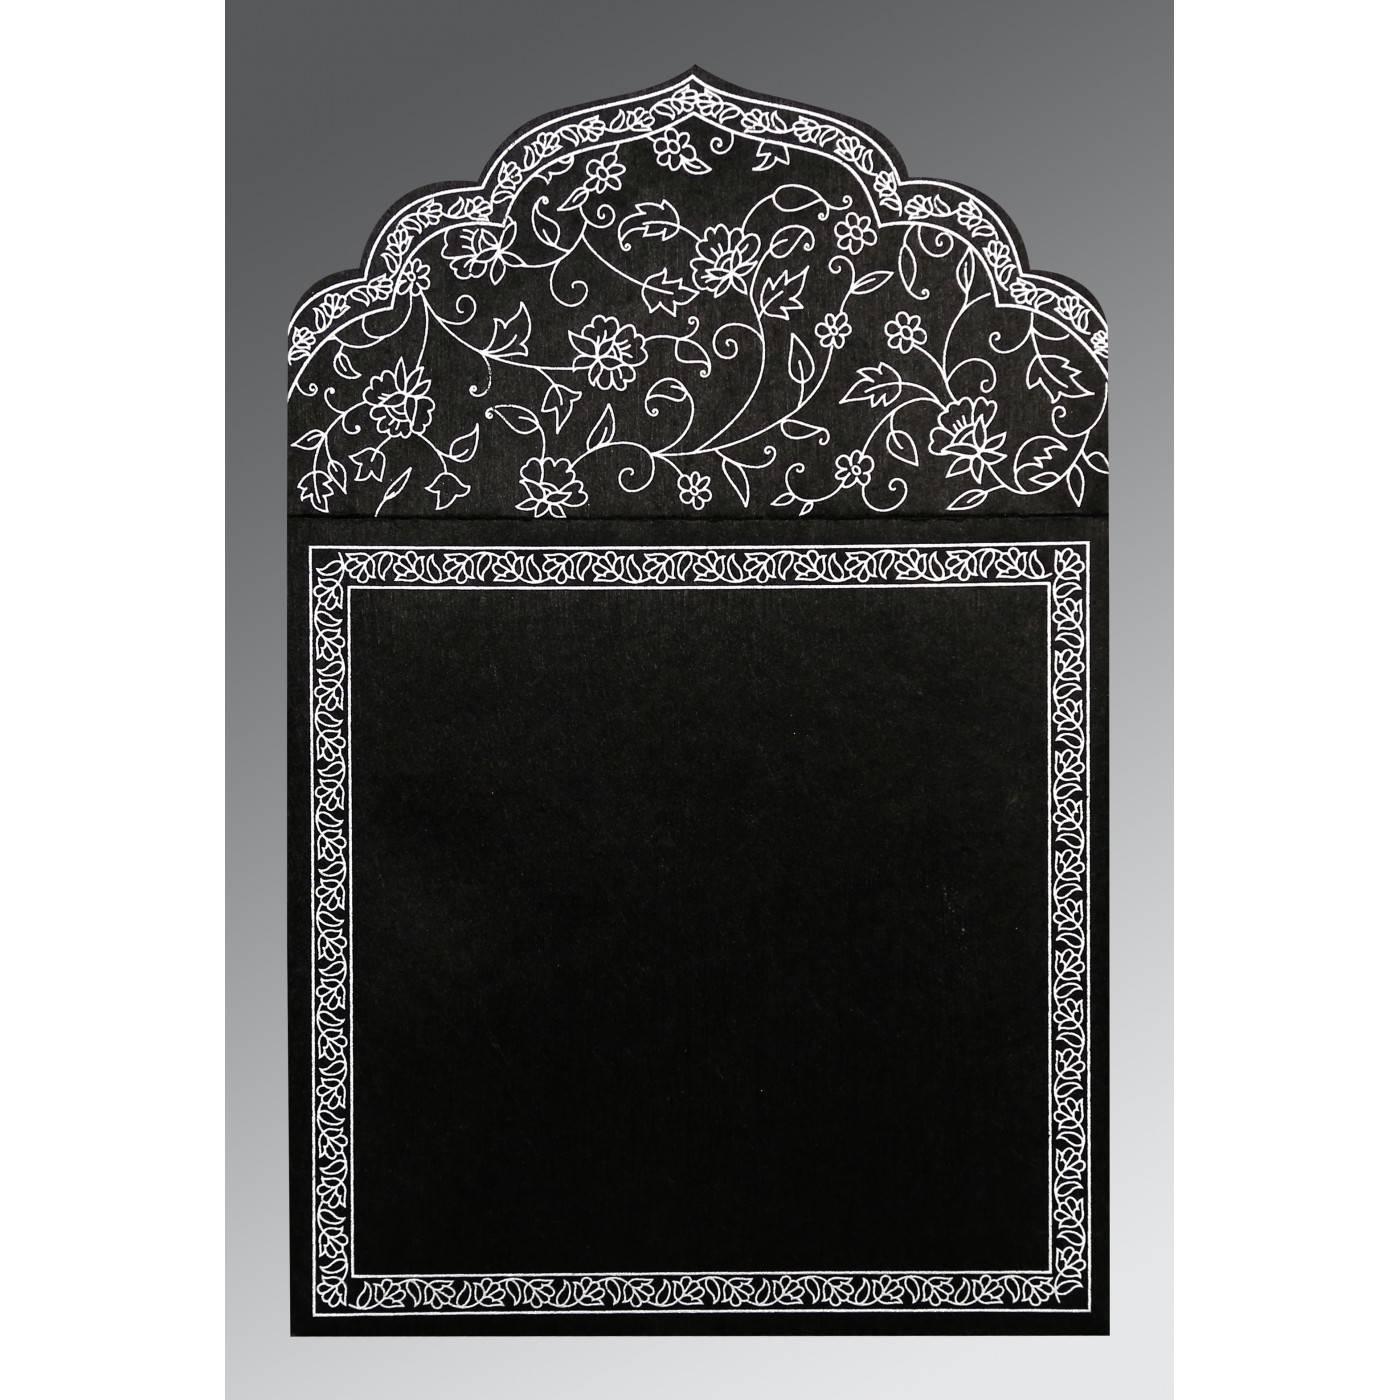 BLACK WOOLY FLORAL THEMED - SCREEN PRINTED WEDDING INVITATION : CG-8211B - IndianWeddingCards